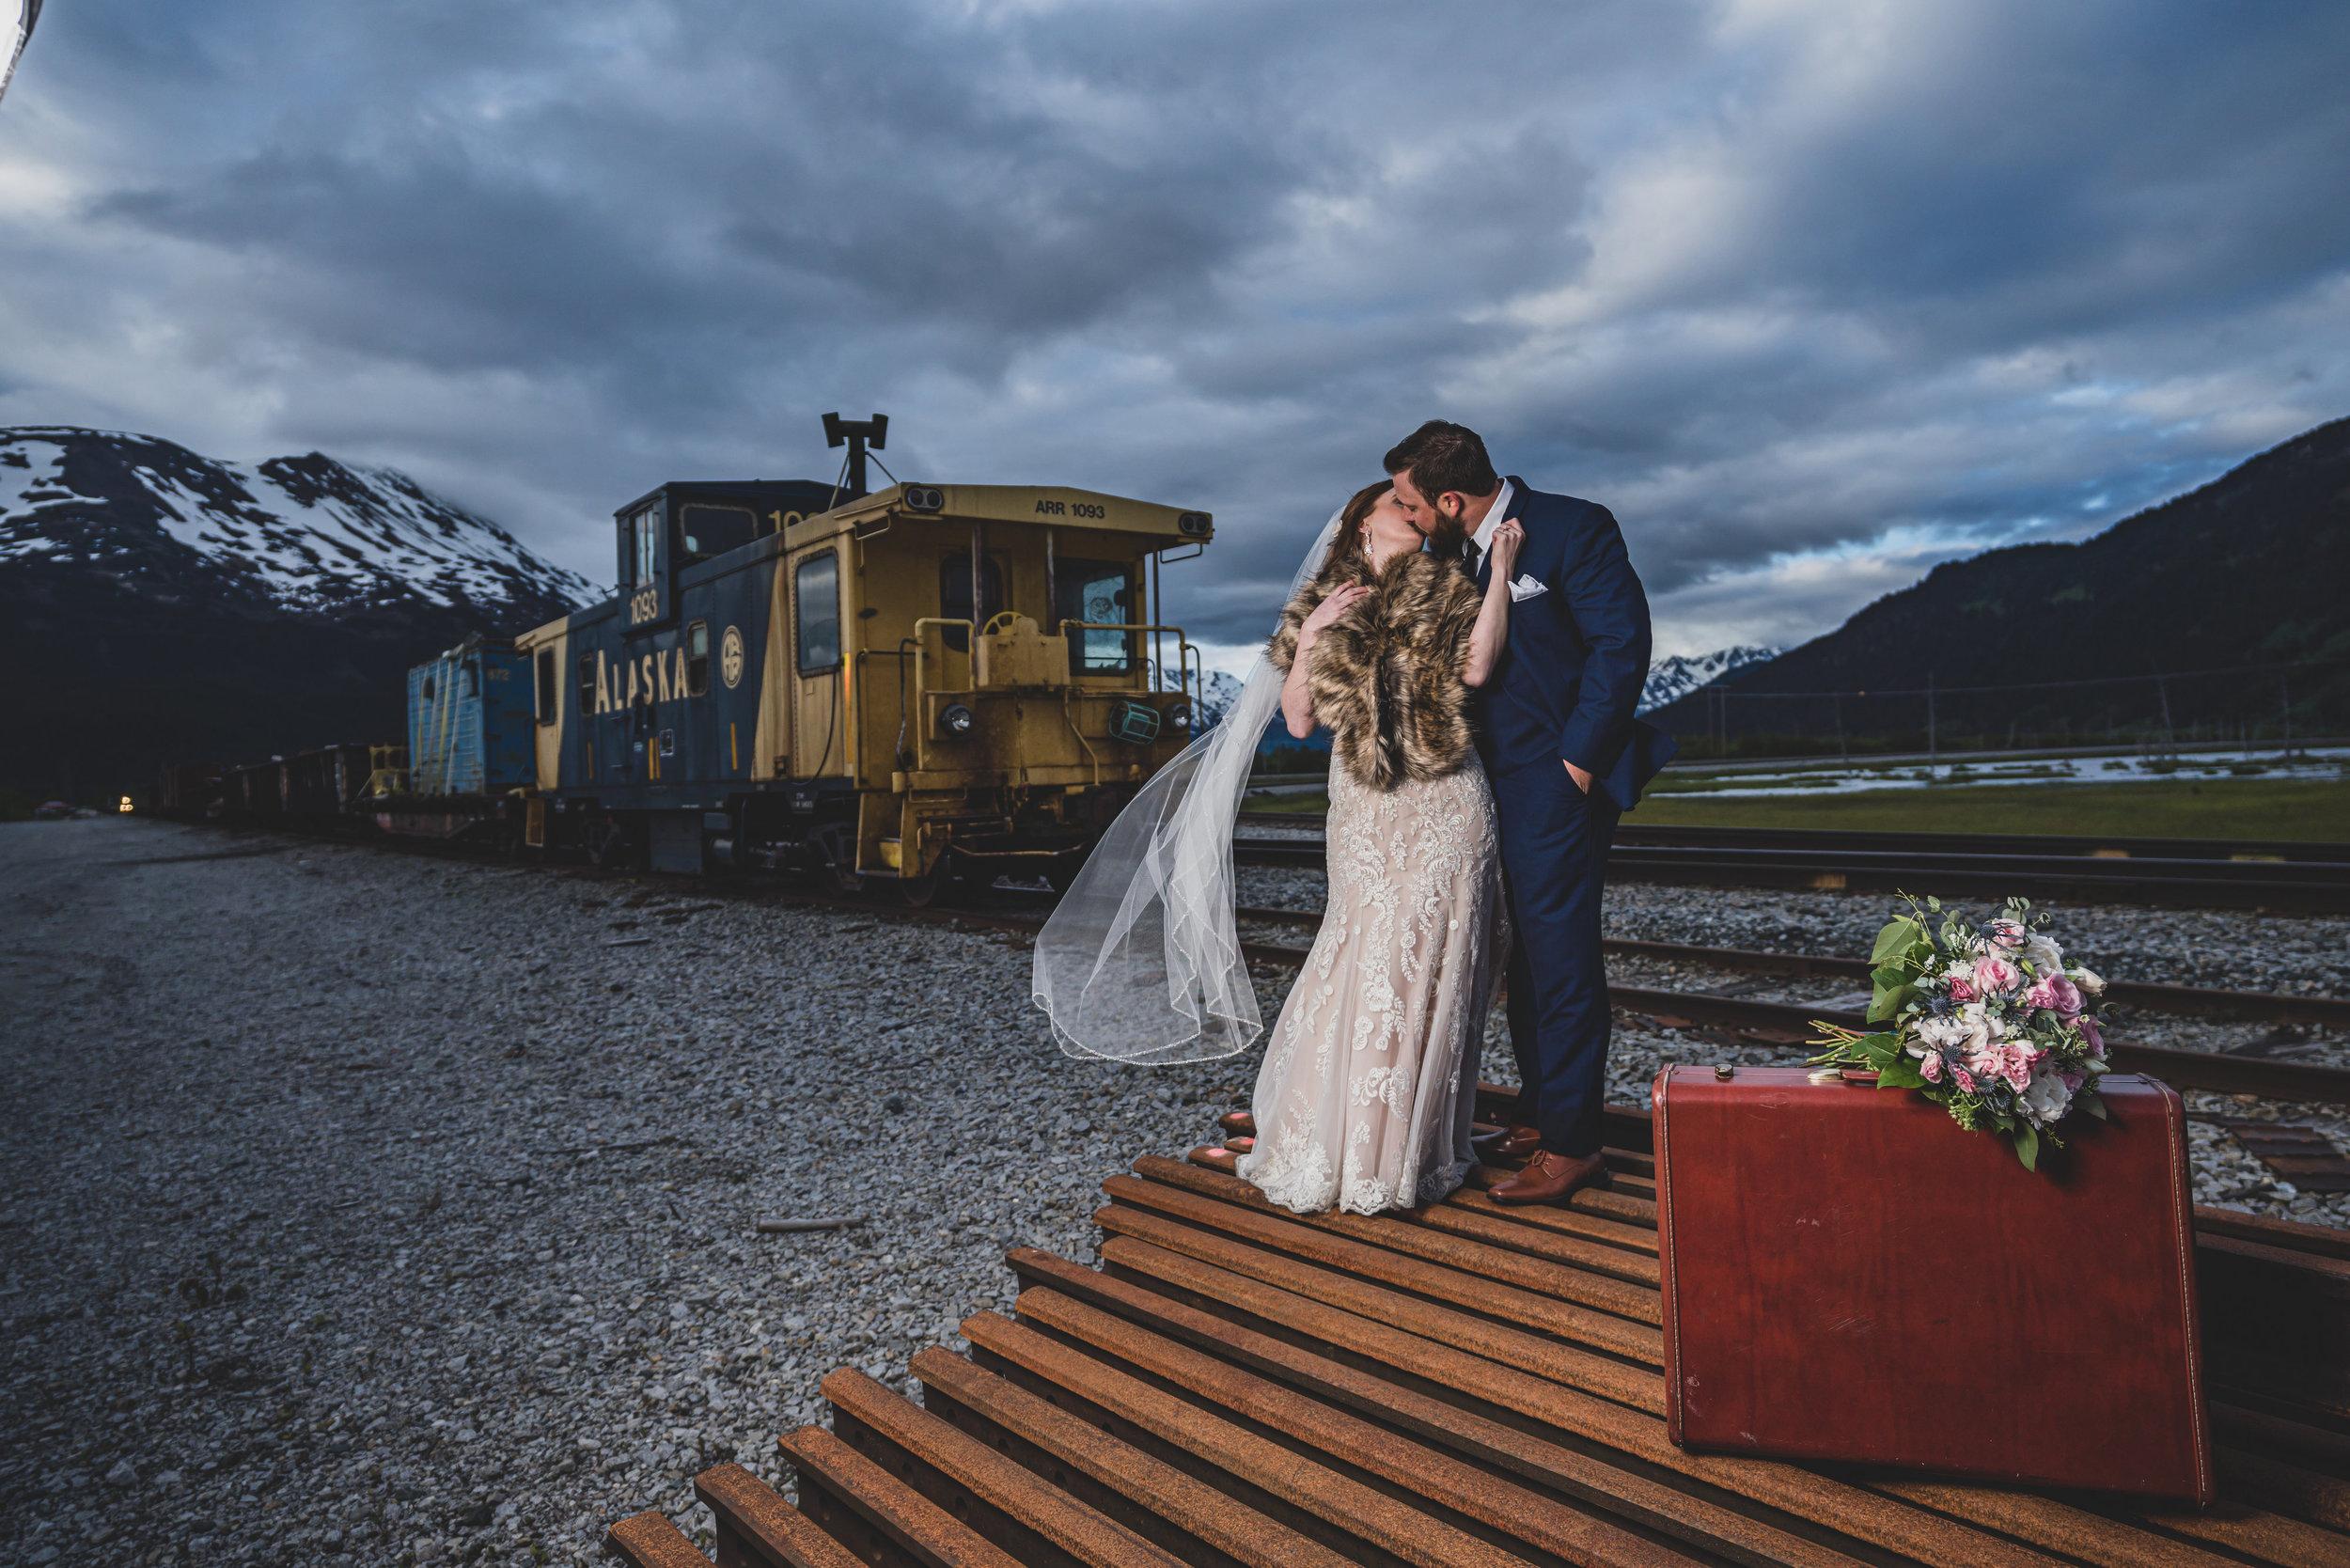 Austin and Kiley Wedding-08 Alaskan Railroad-0022.jpg